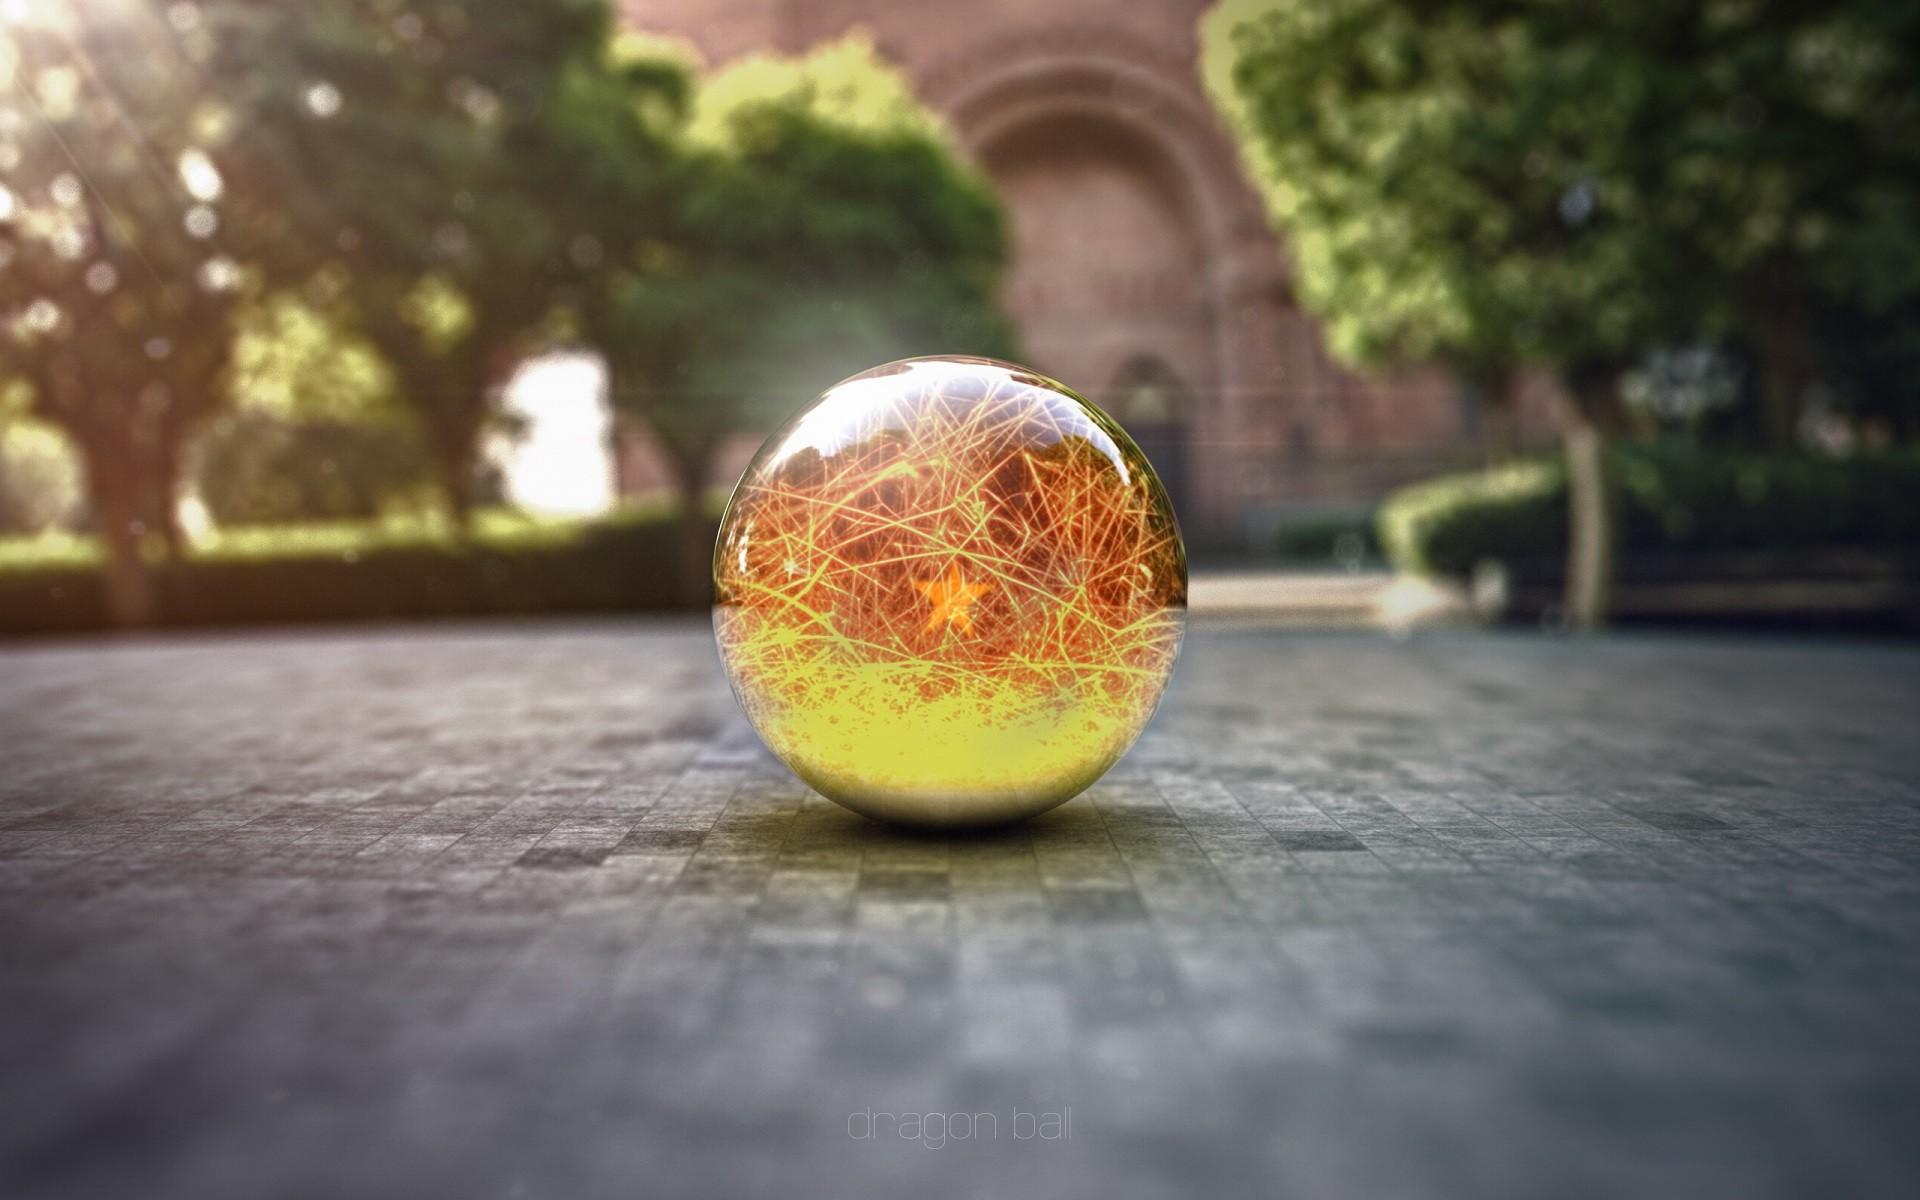 Wonderful Wallpaper Marble Ball - sunlight-digital-art-reflection-sphere-green-yellow-Dragon-Ball-marble-light-leaf-flower-plant-lighting-shape-1920x1200-px-macro-photography-567314  Photograph_297235.jpg